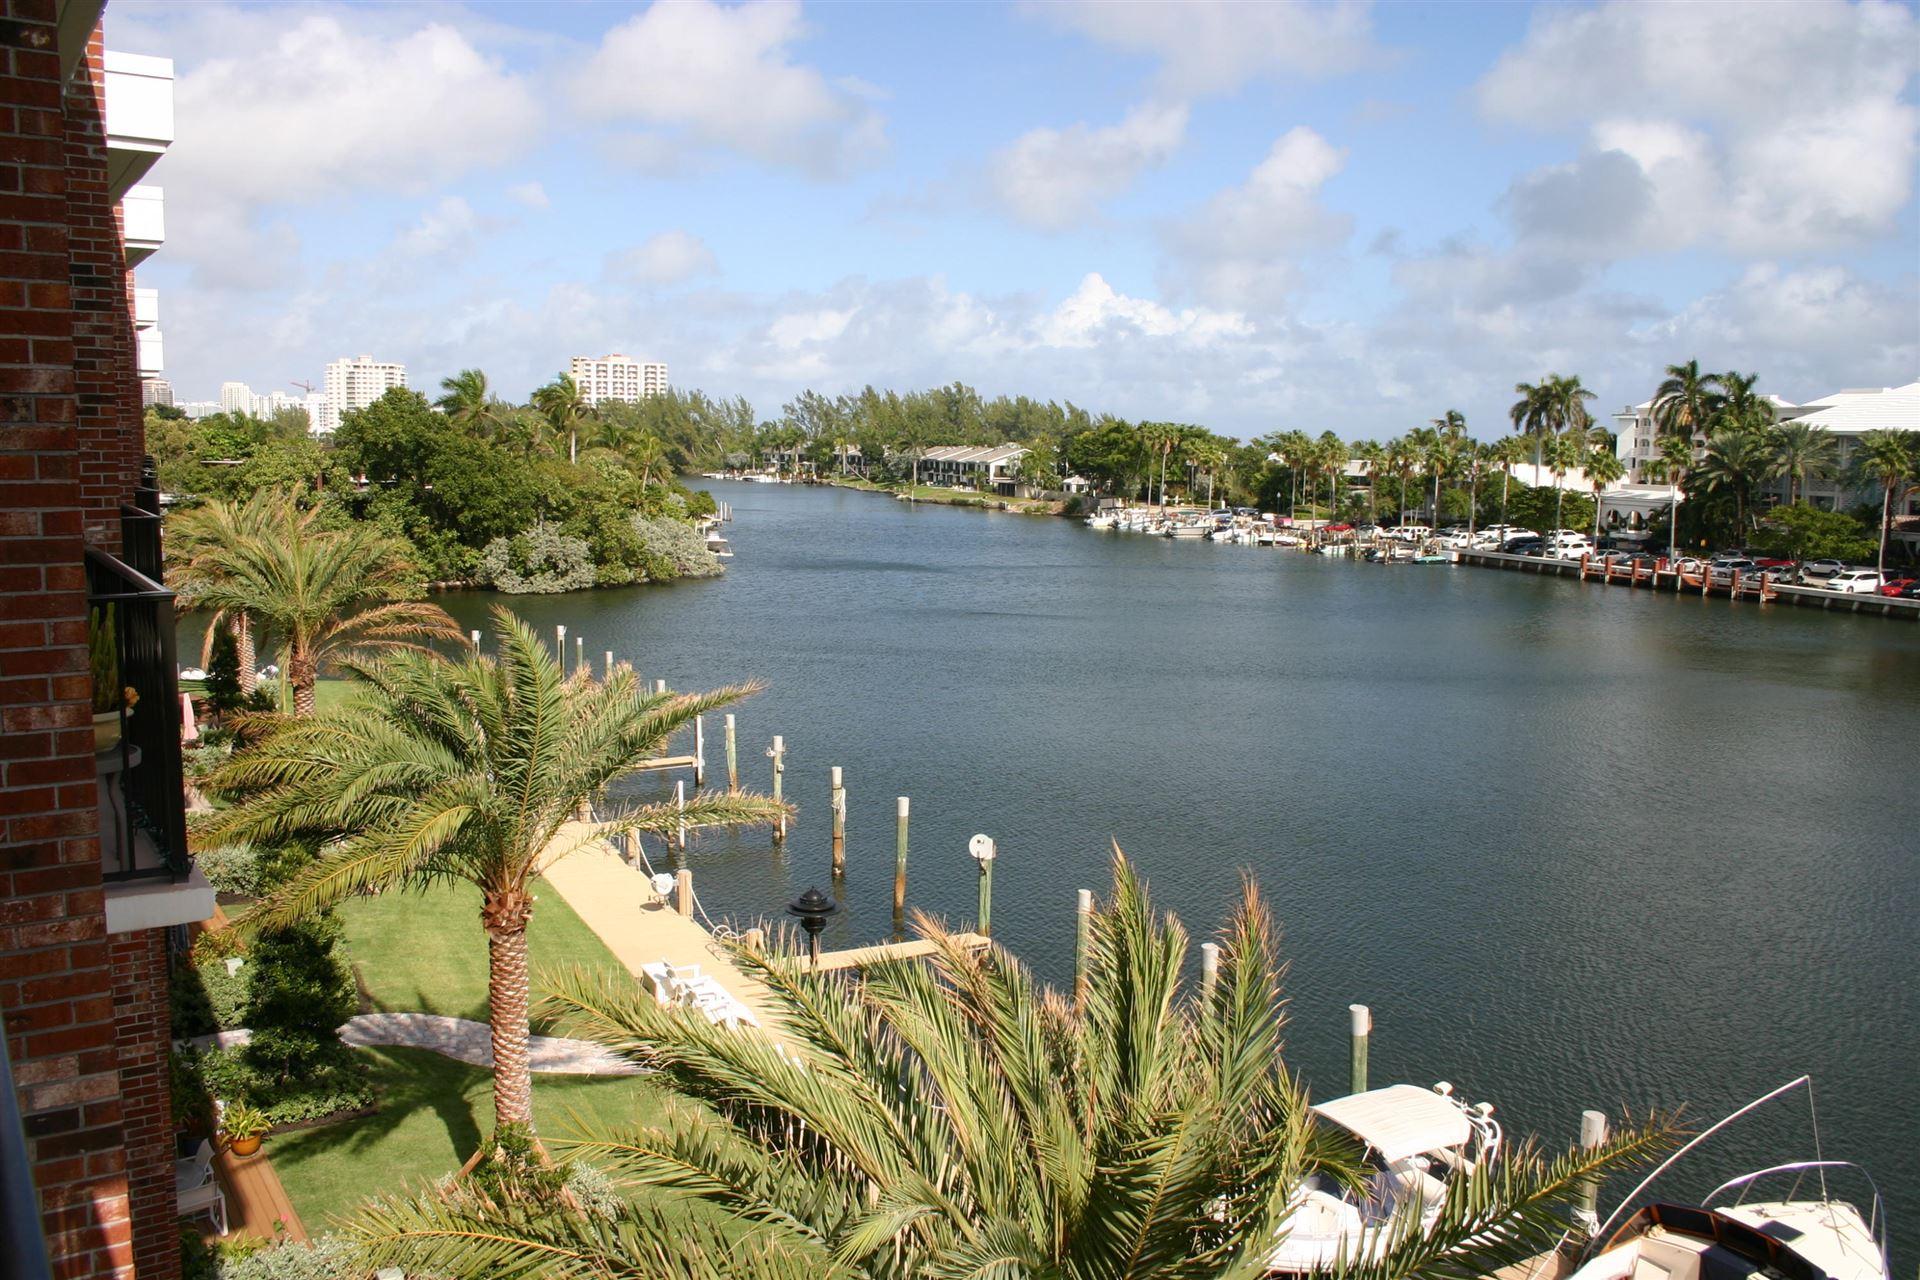 1800 S Ocean Drive #411, Fort Lauderdale, FL 33316 - MLS#: RX-10604779